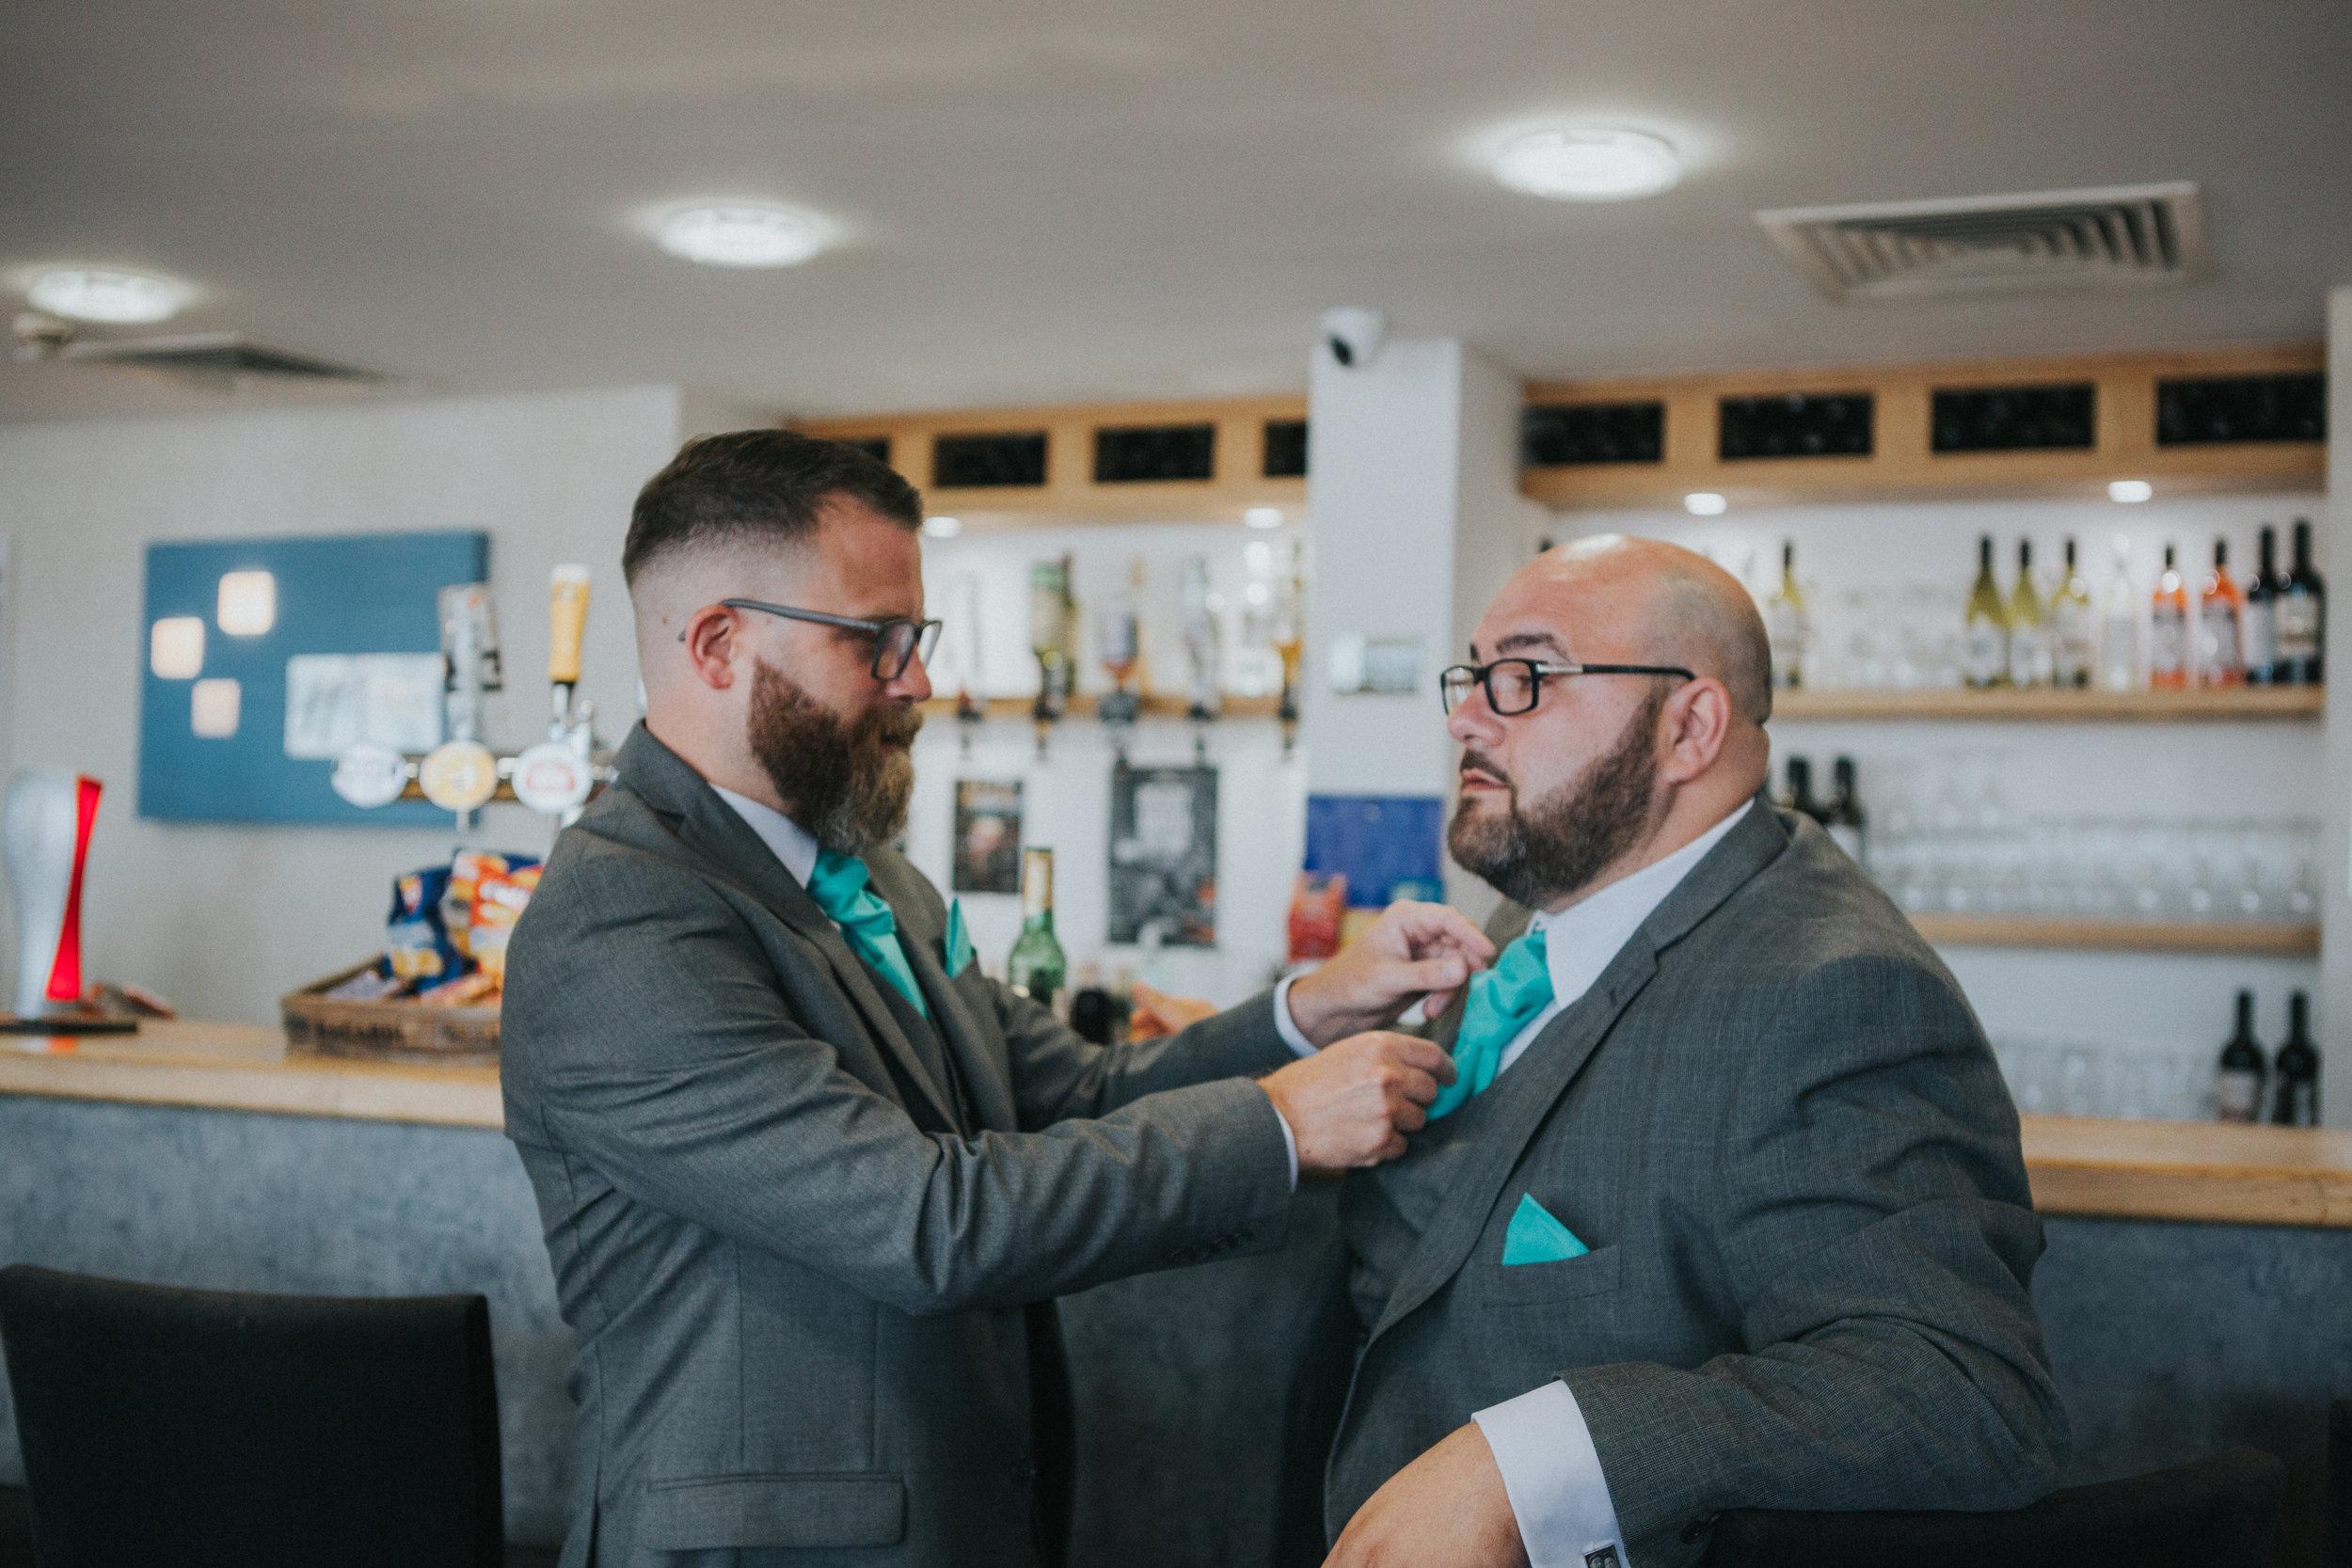 westenhangar-castle-kent-london-wedding-photography-groom-prep-16